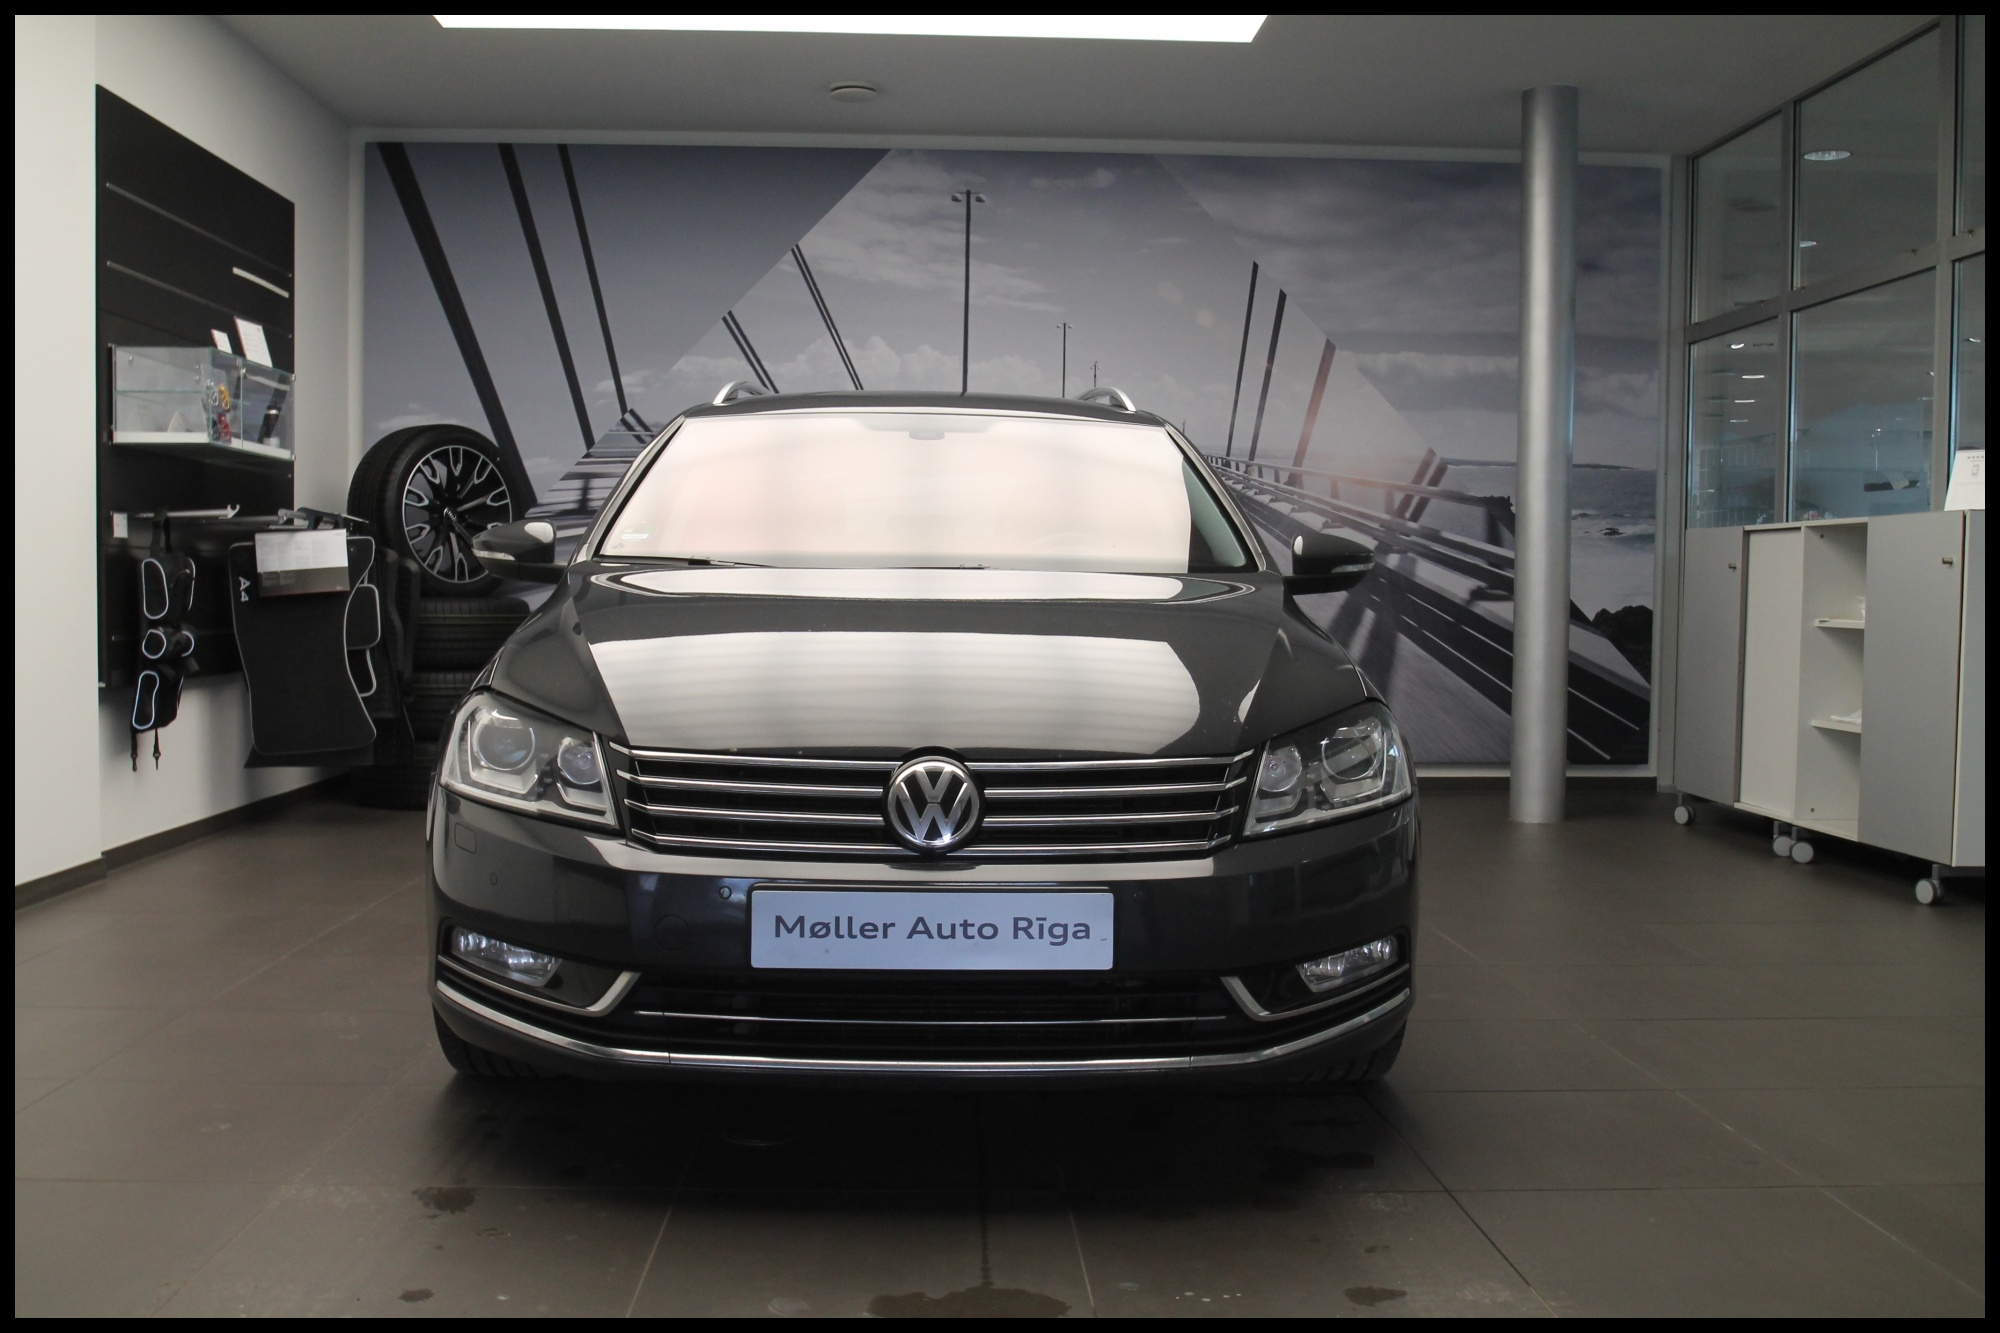 Volkswagen Passat Universal Highline 2 0D Aut 140Zs 2 0 103kW aut